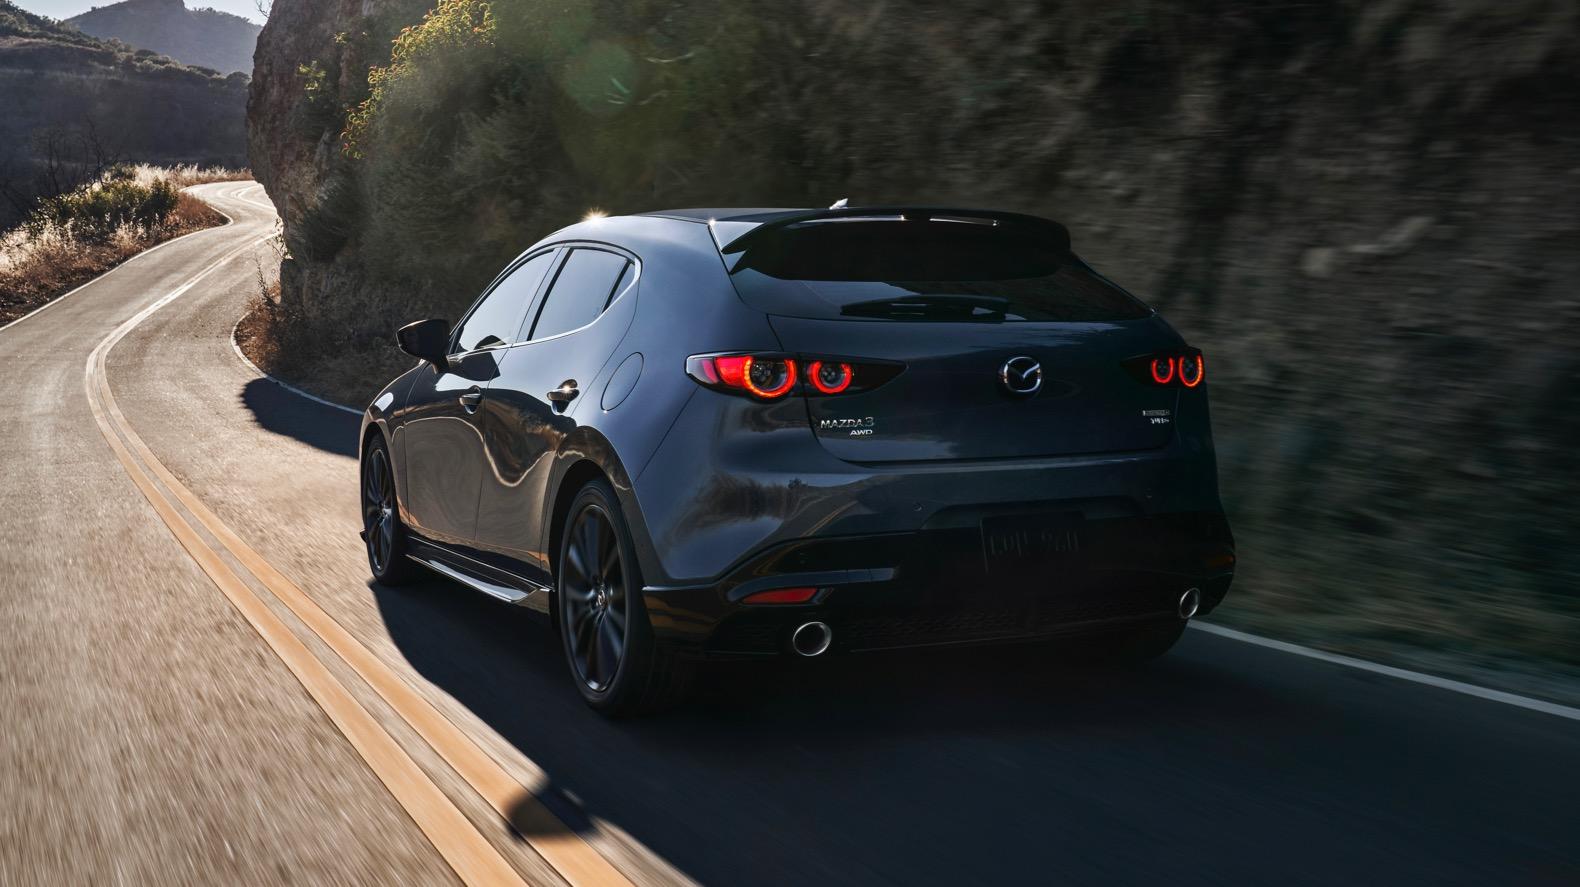 2021 mazda3 2.5 turbo starts at $29,900 | the torque report